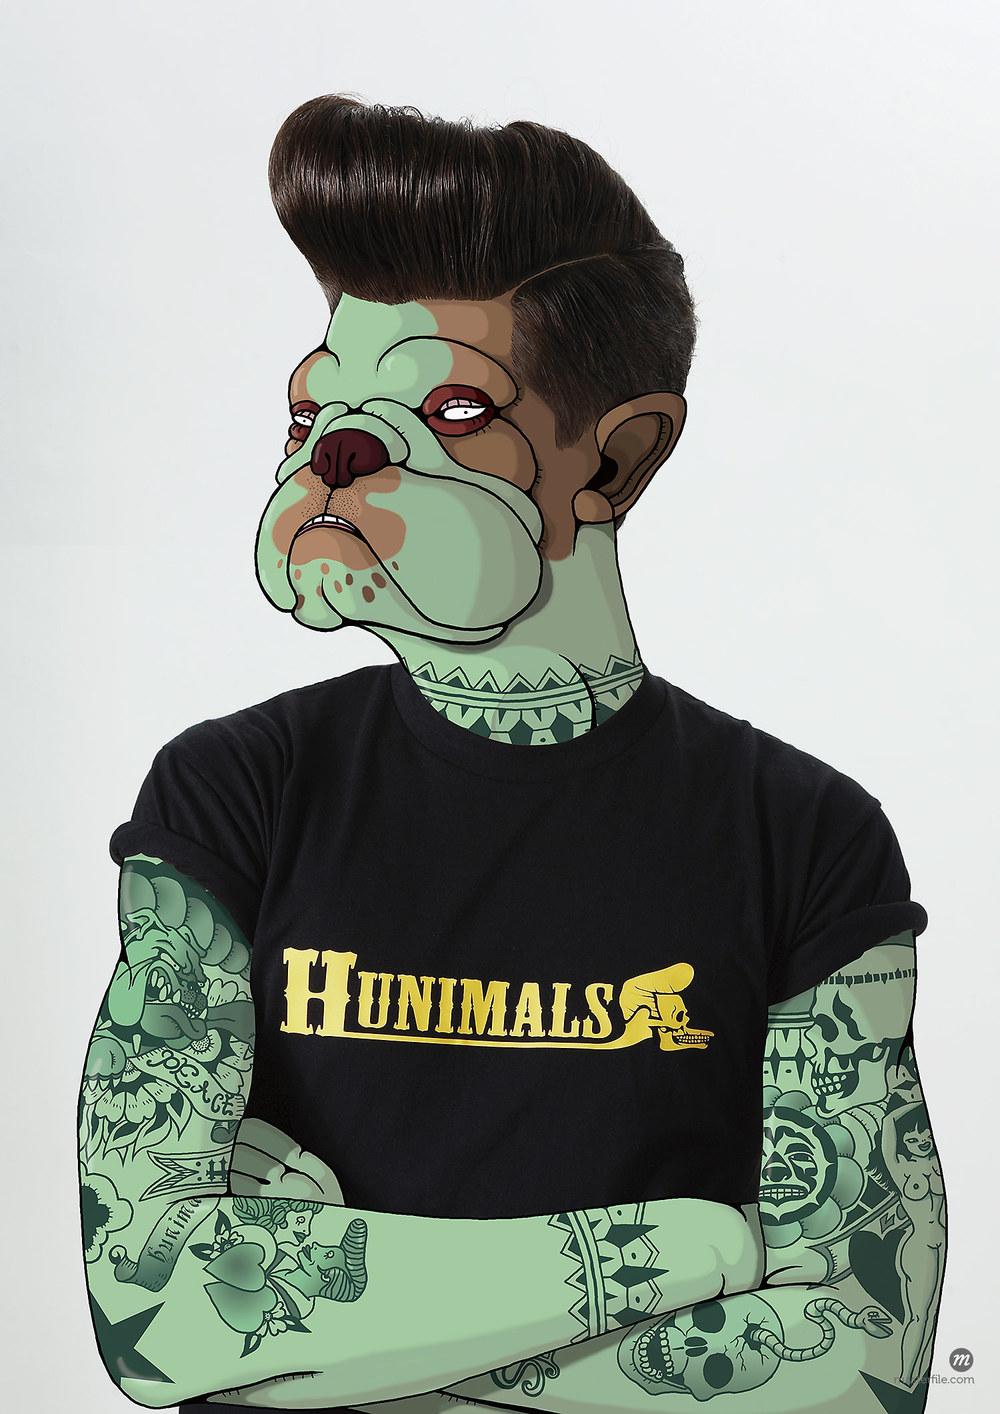 Man with tattoos and bulldog face© Ikon Images / Masterfile